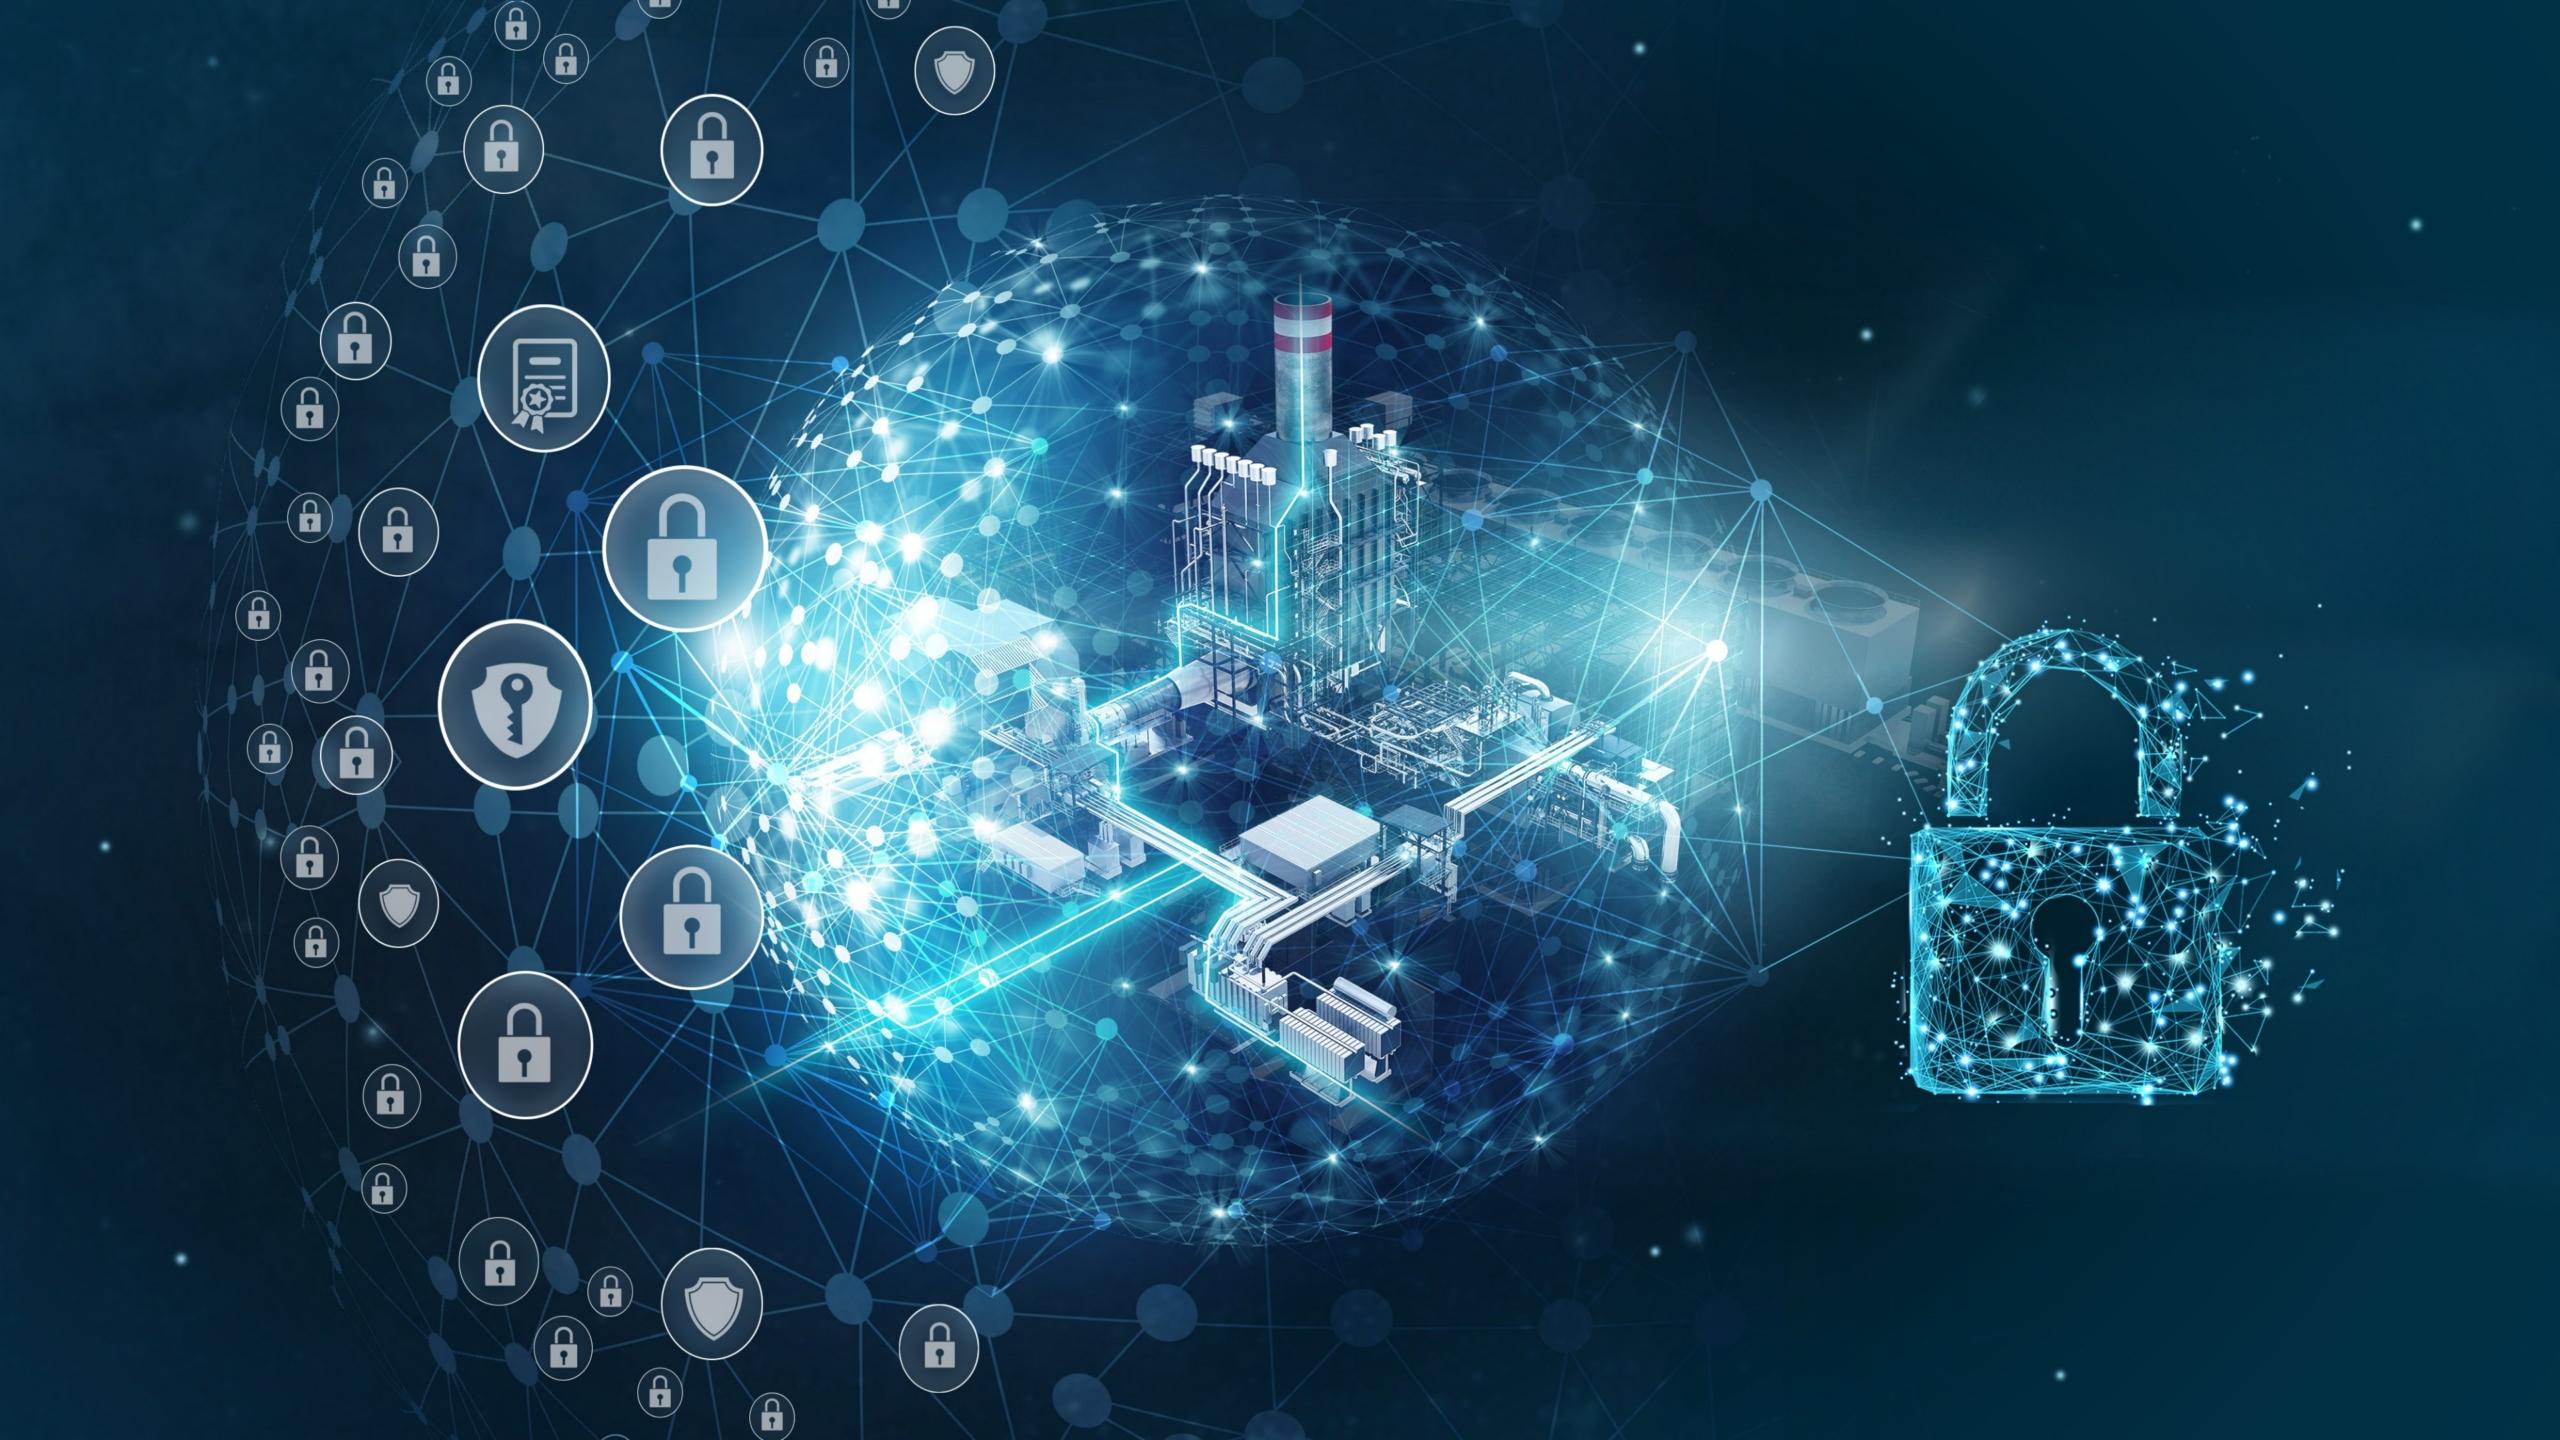 مدیریت ریسک امنیت سایبری